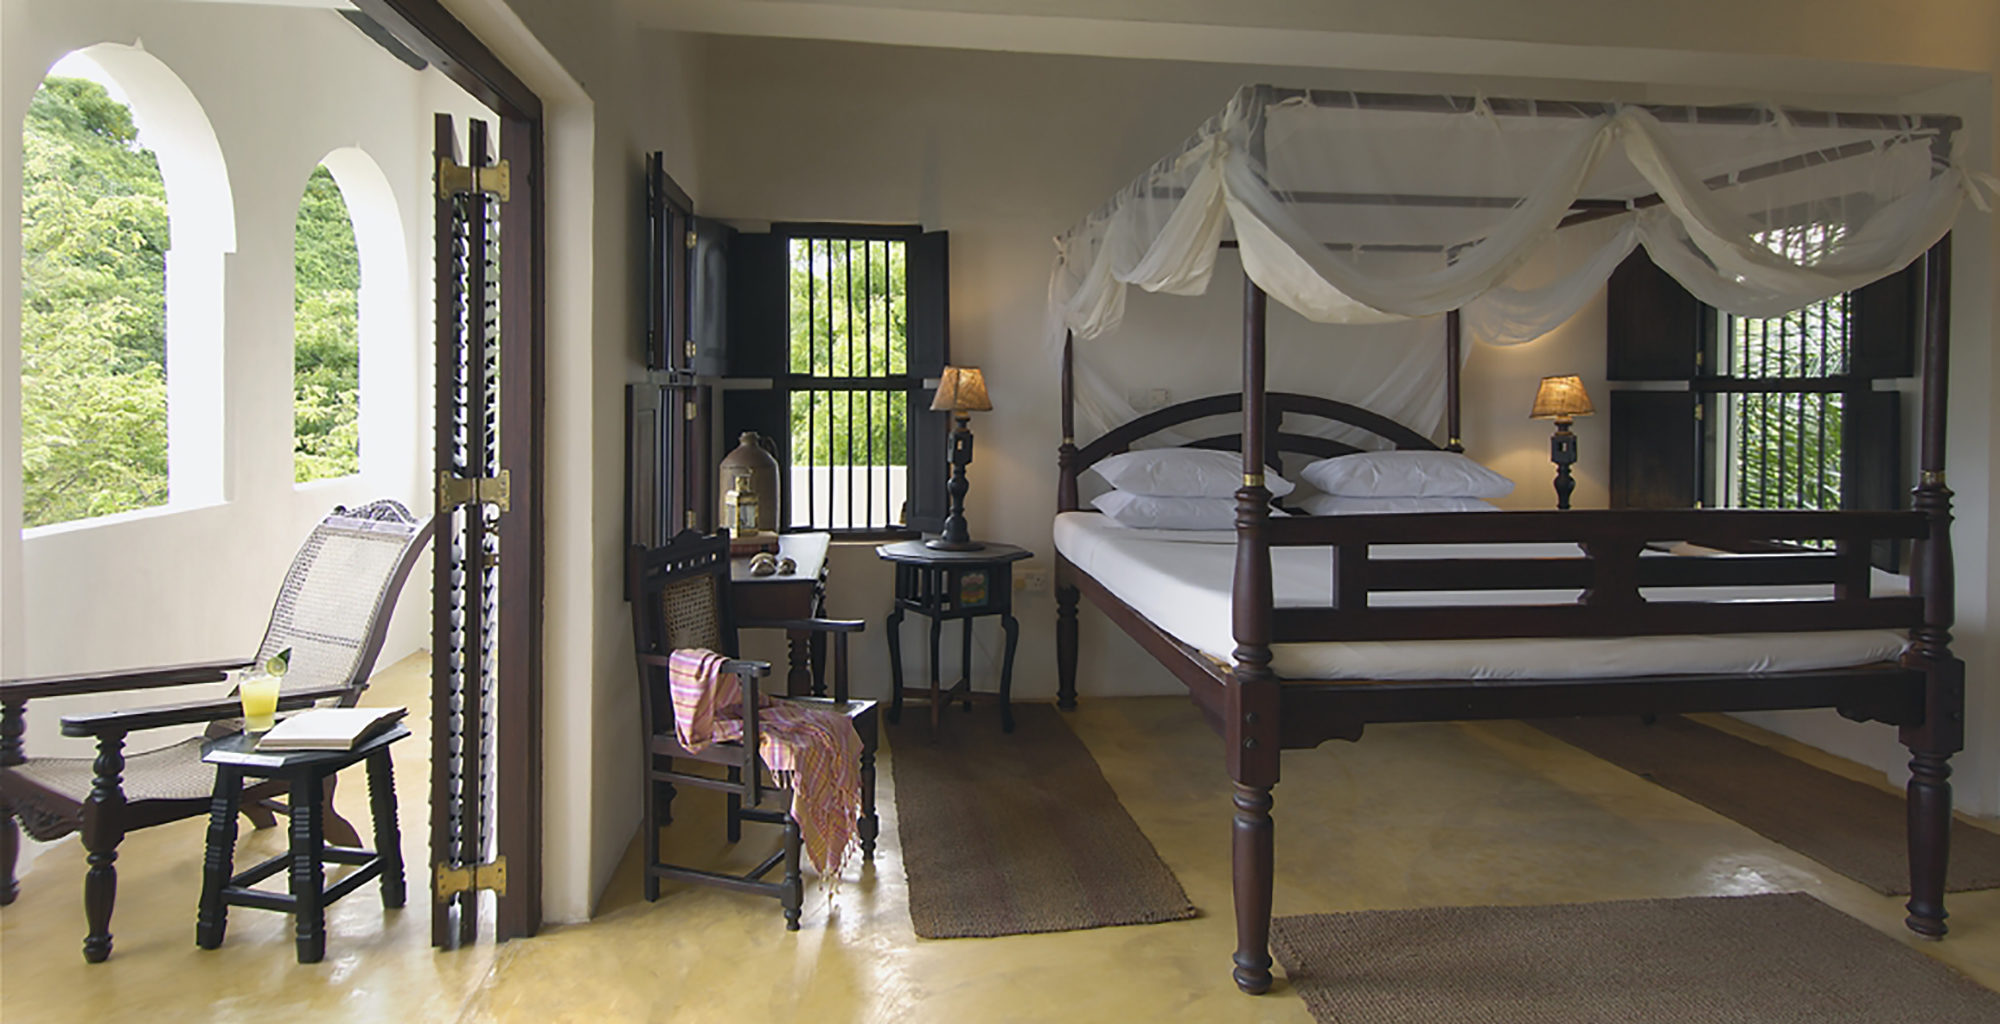 Kenya-Shela-And-Palm-House-Bedroom